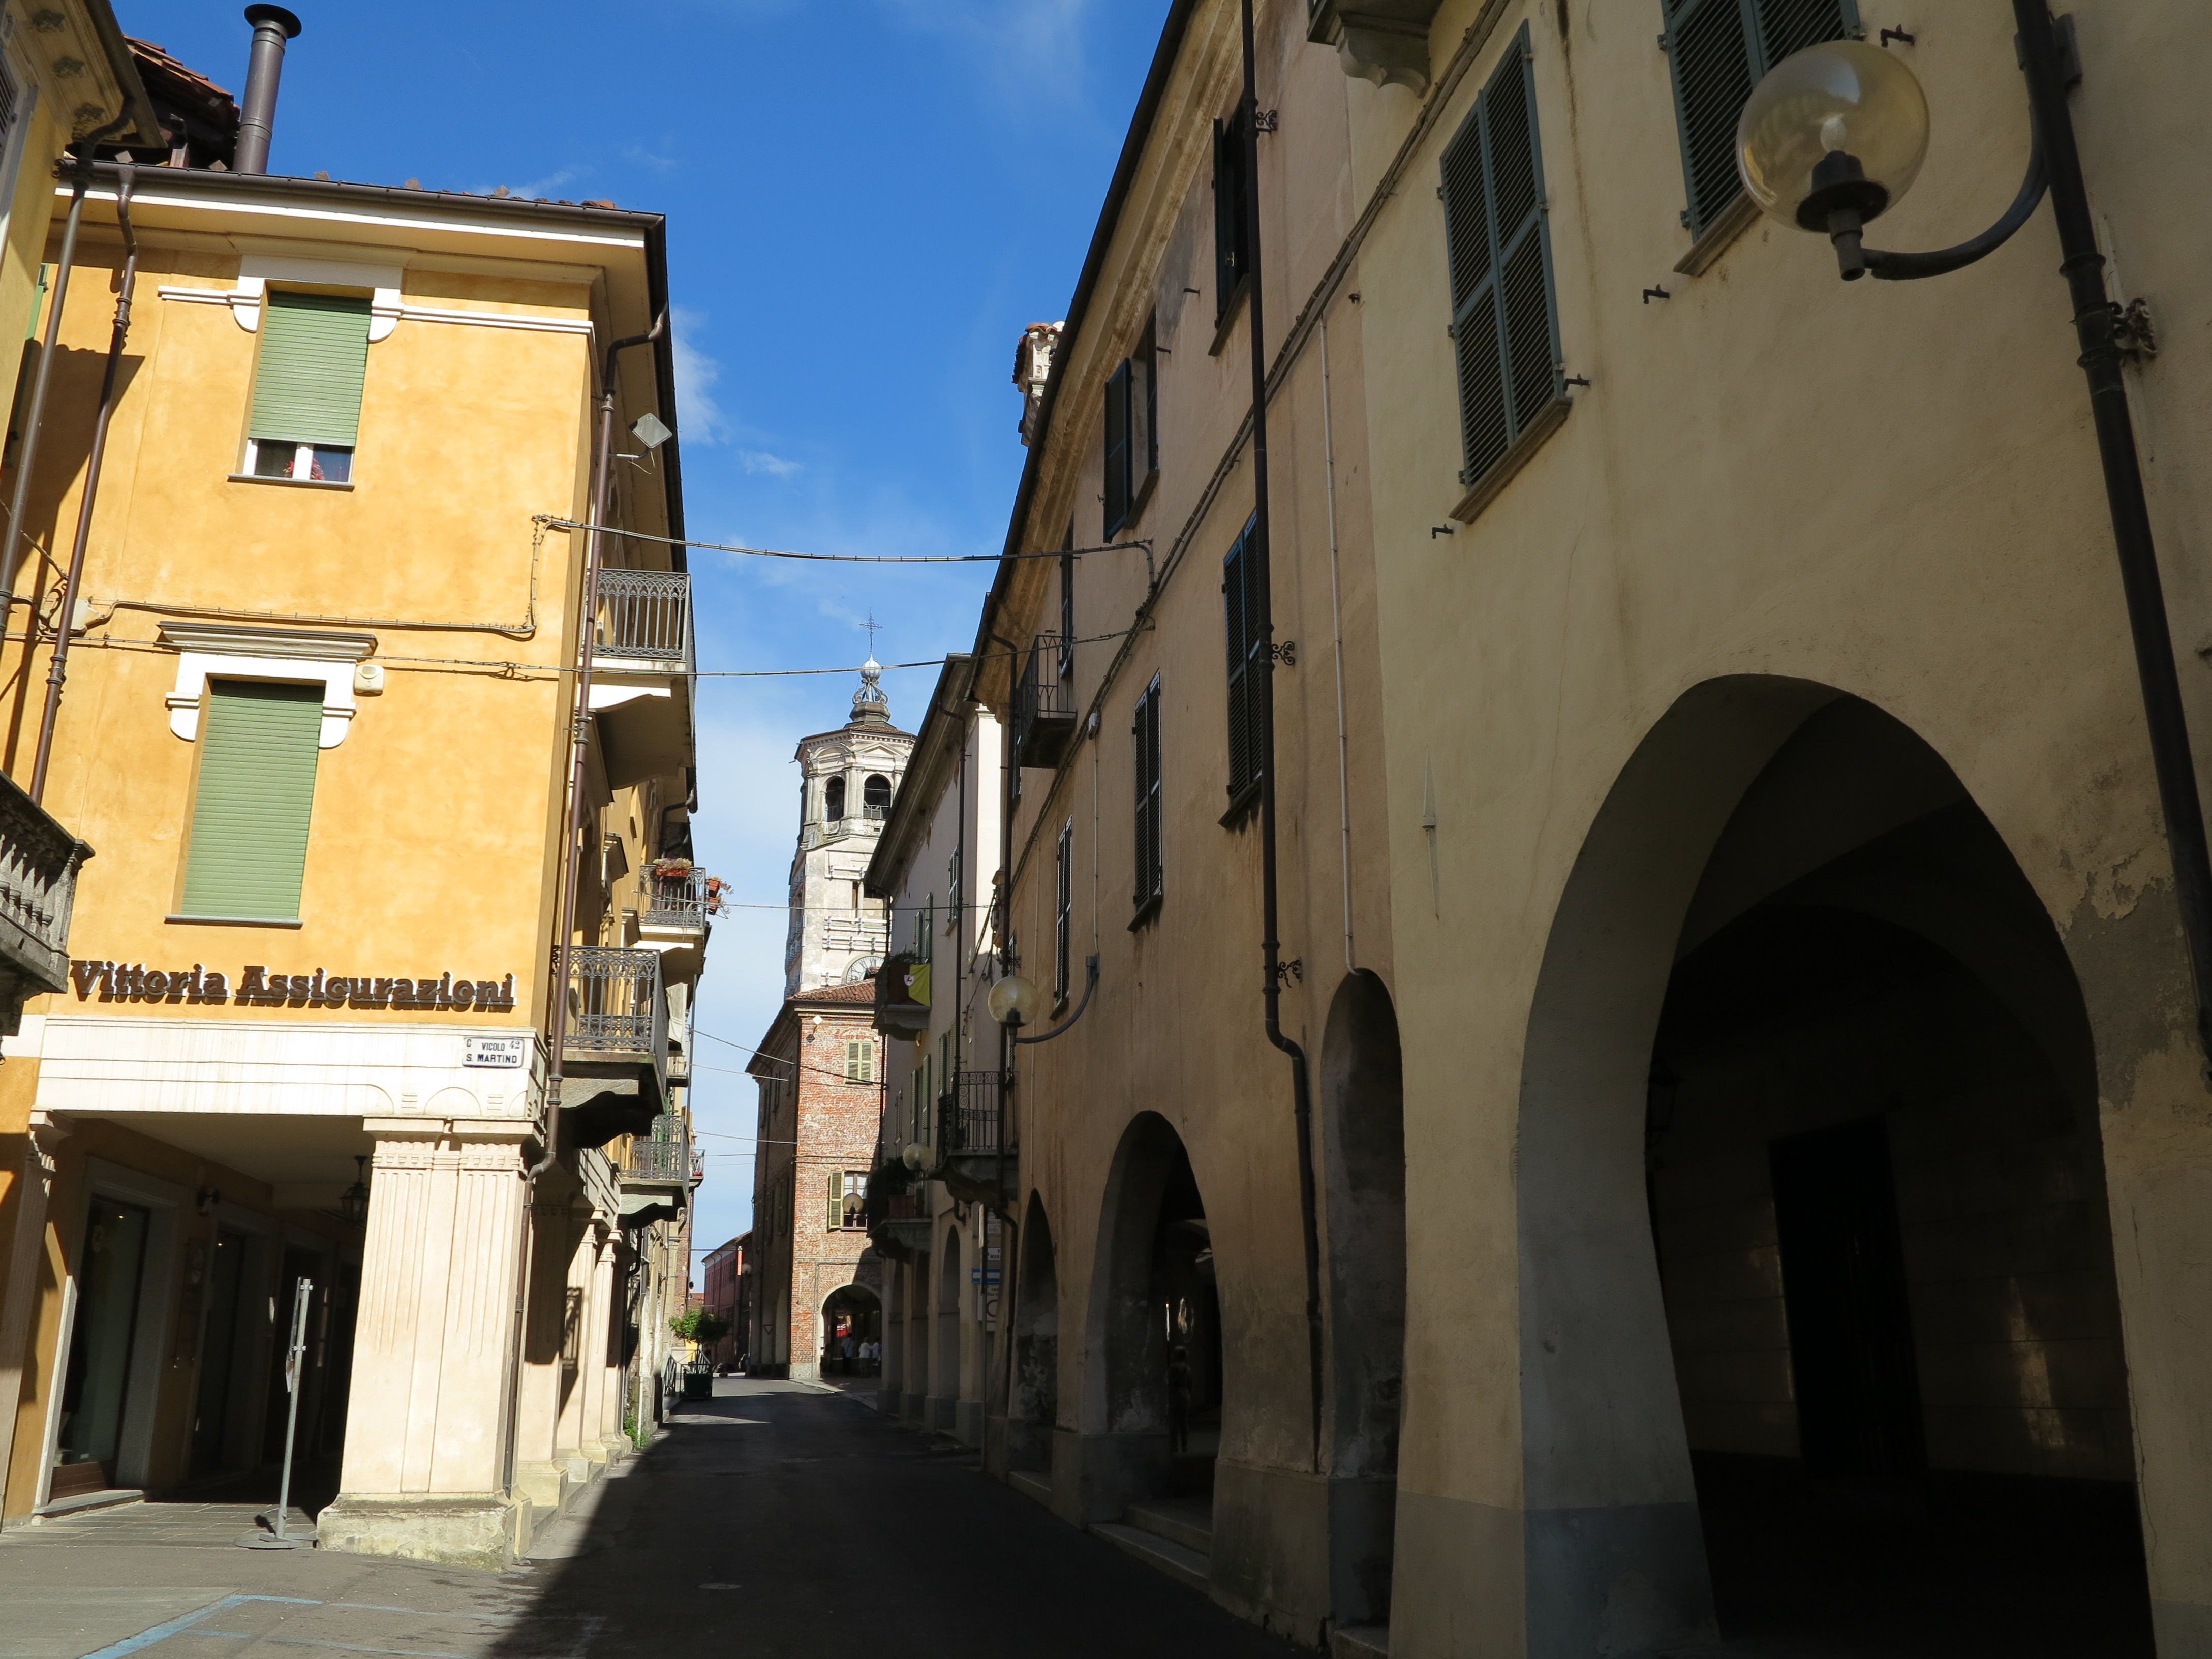 File:Centro storico, Fossano (1).JPG